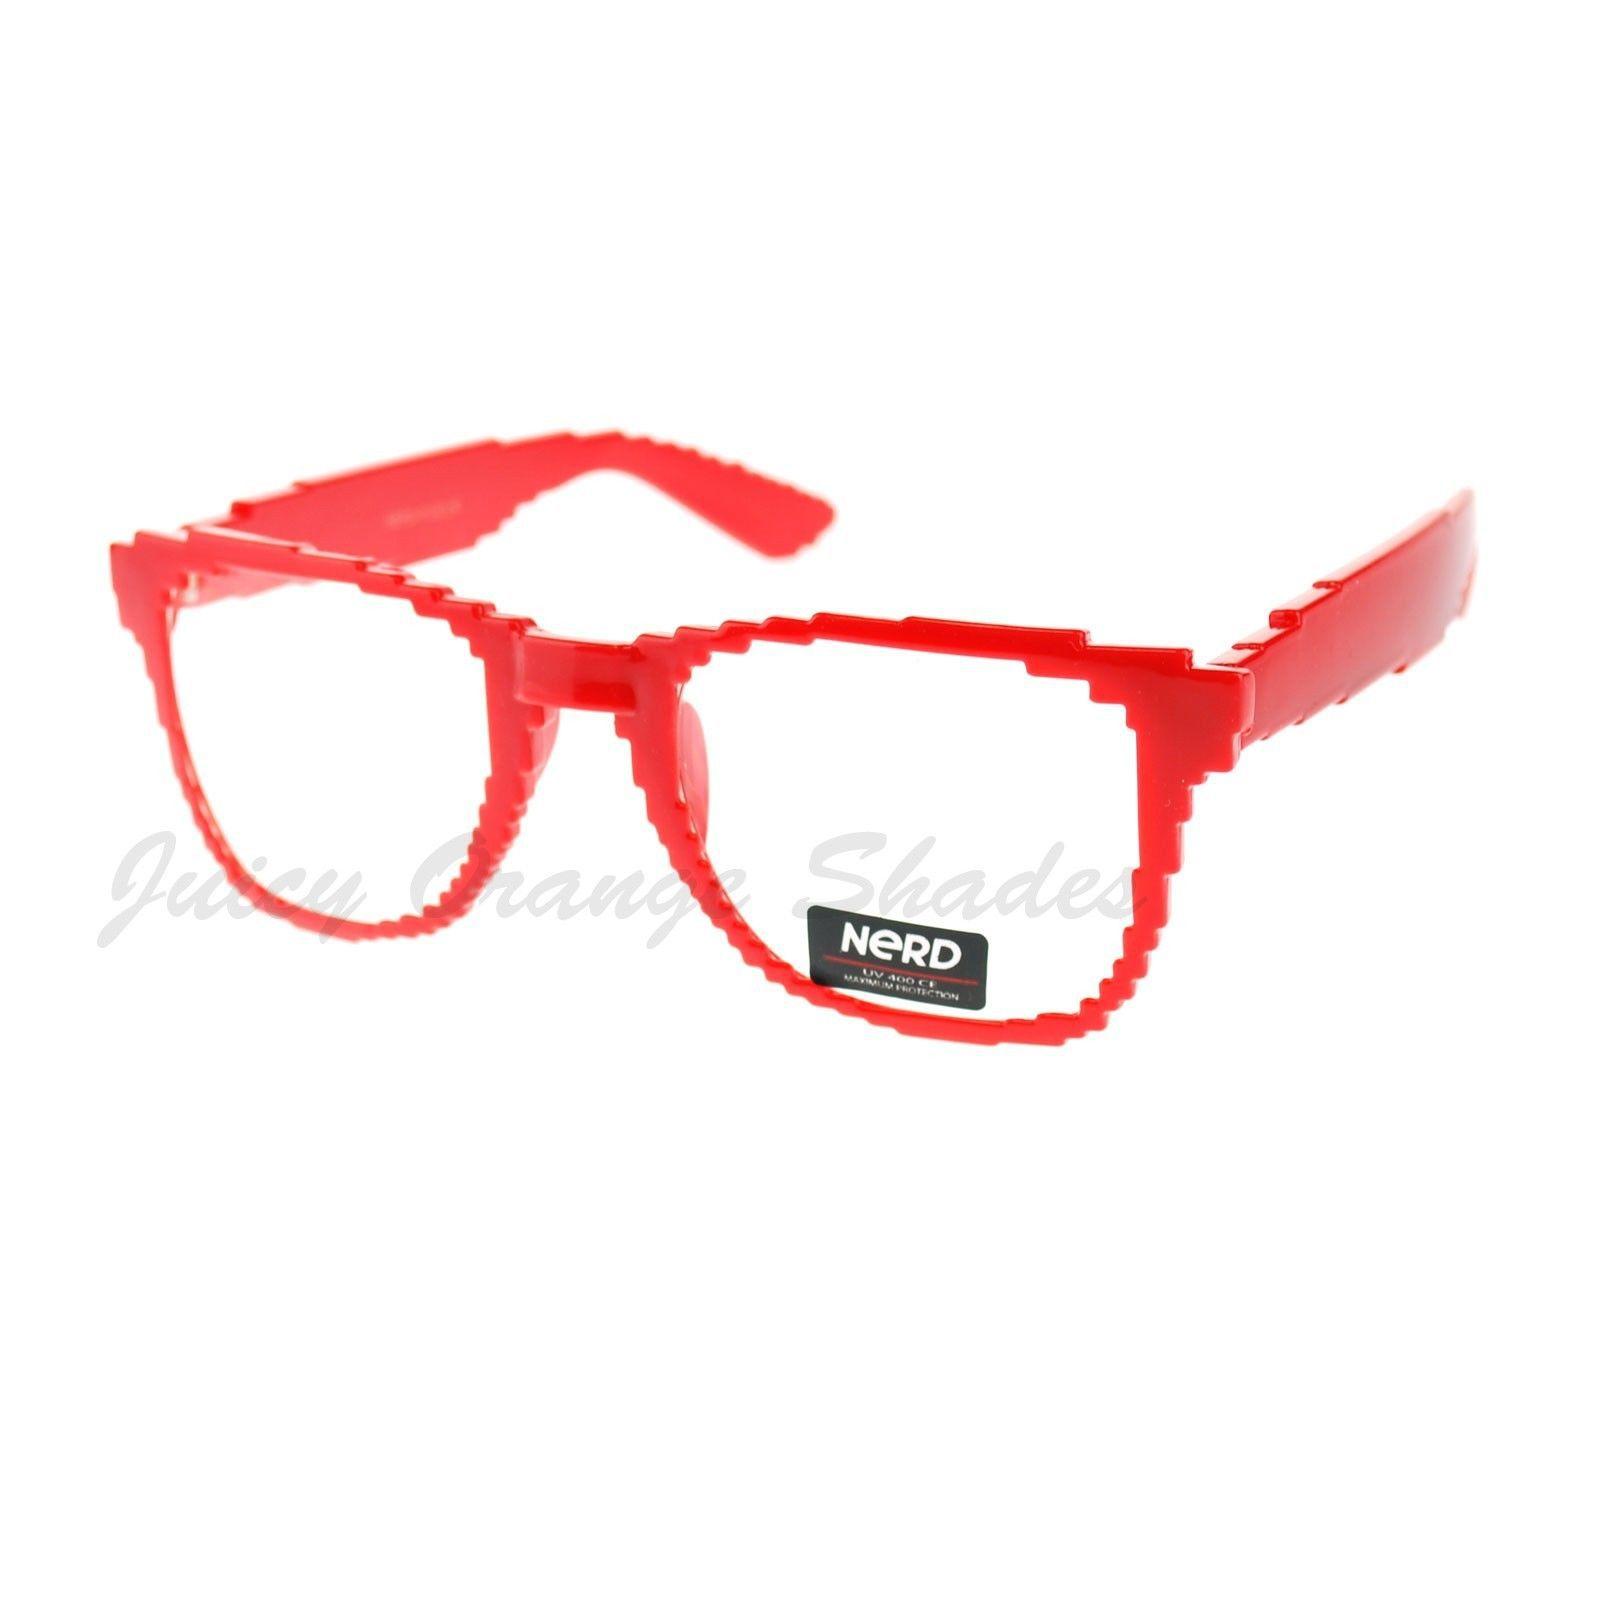 Pixelated Clear Lens Glasses Pixel Digital Fashion Eyeglasses